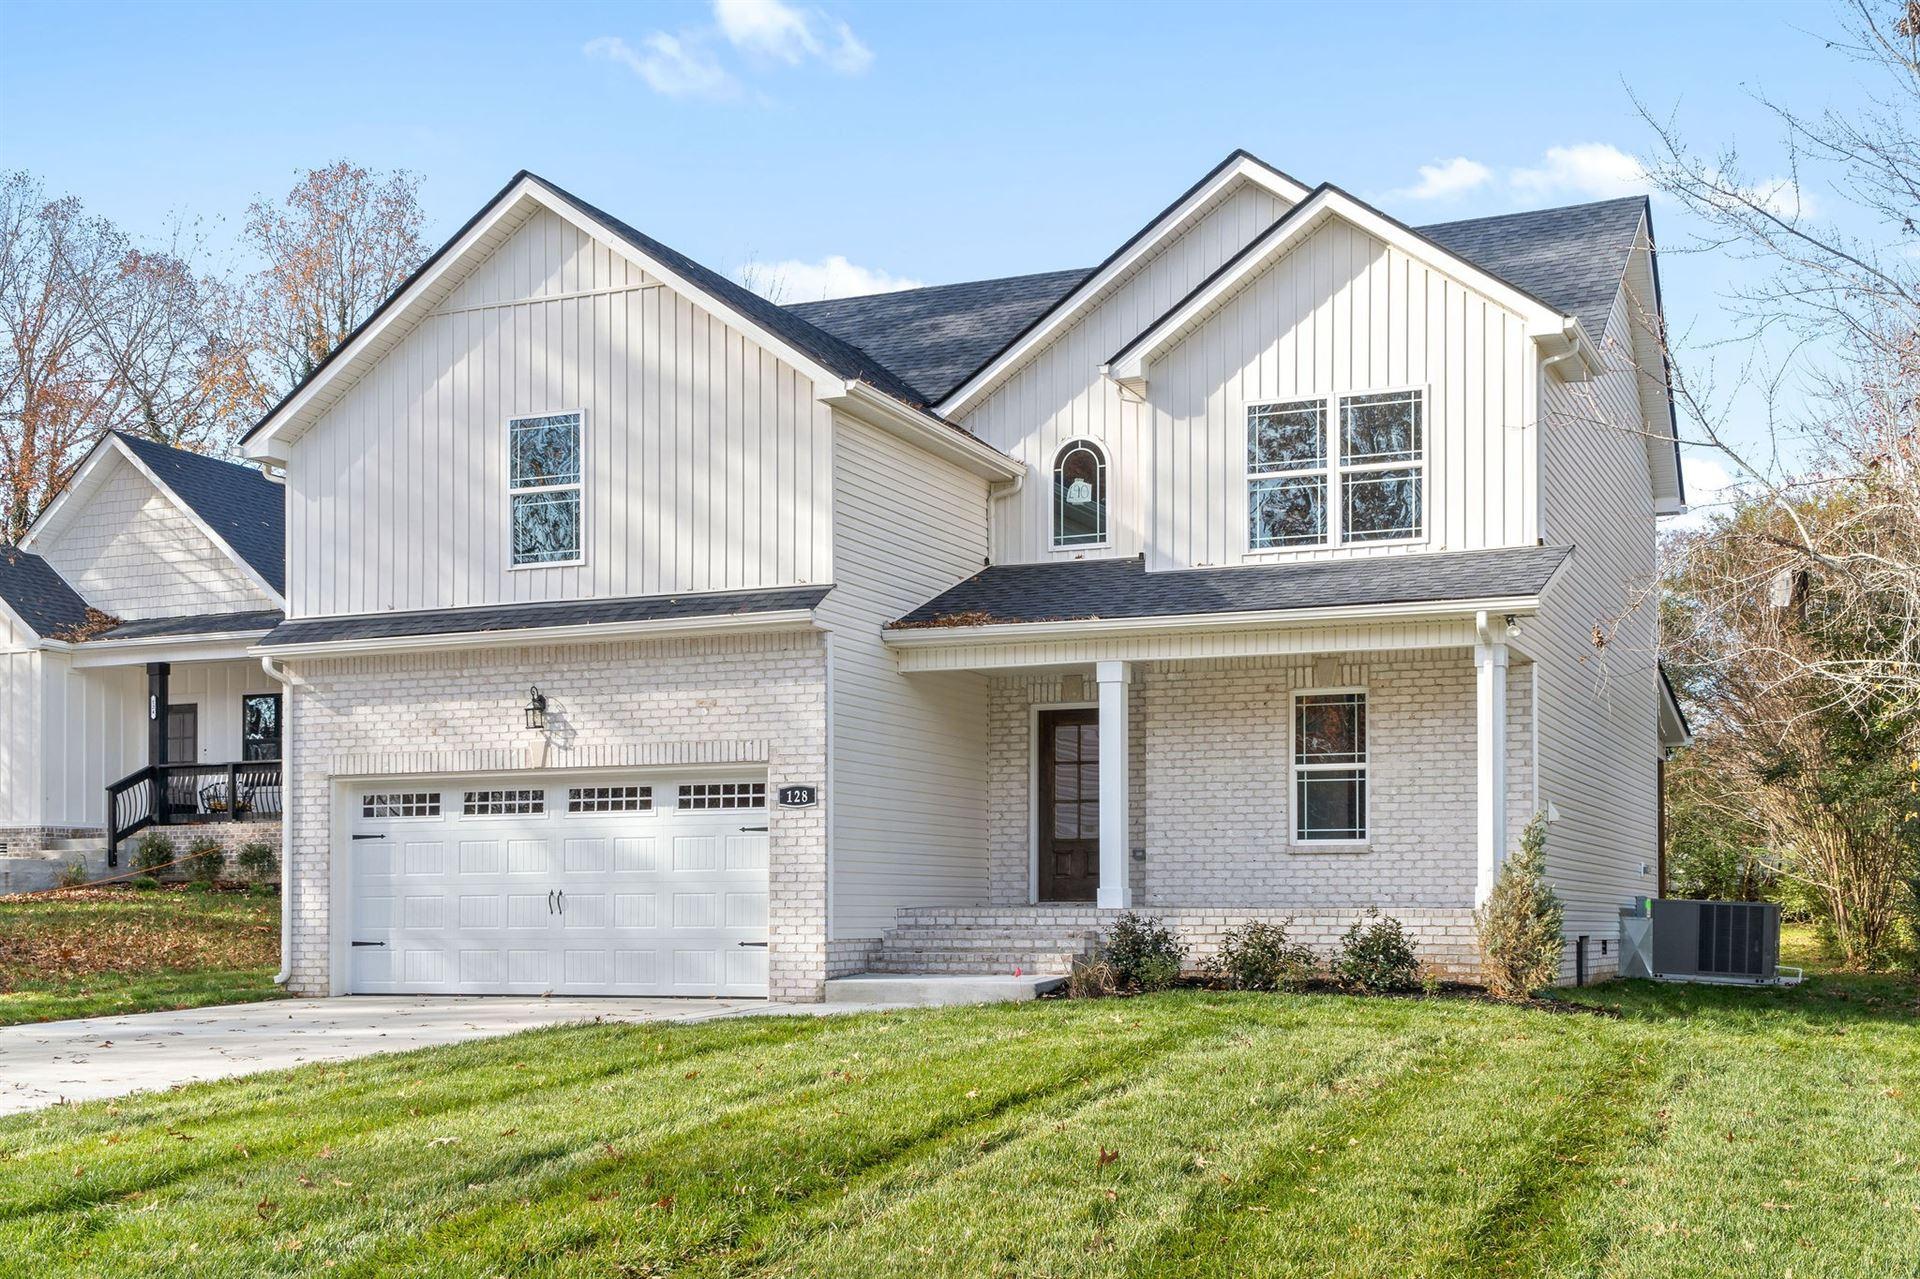 190 Bellmont, Clarksville, TN 37043 - MLS#: 2292760